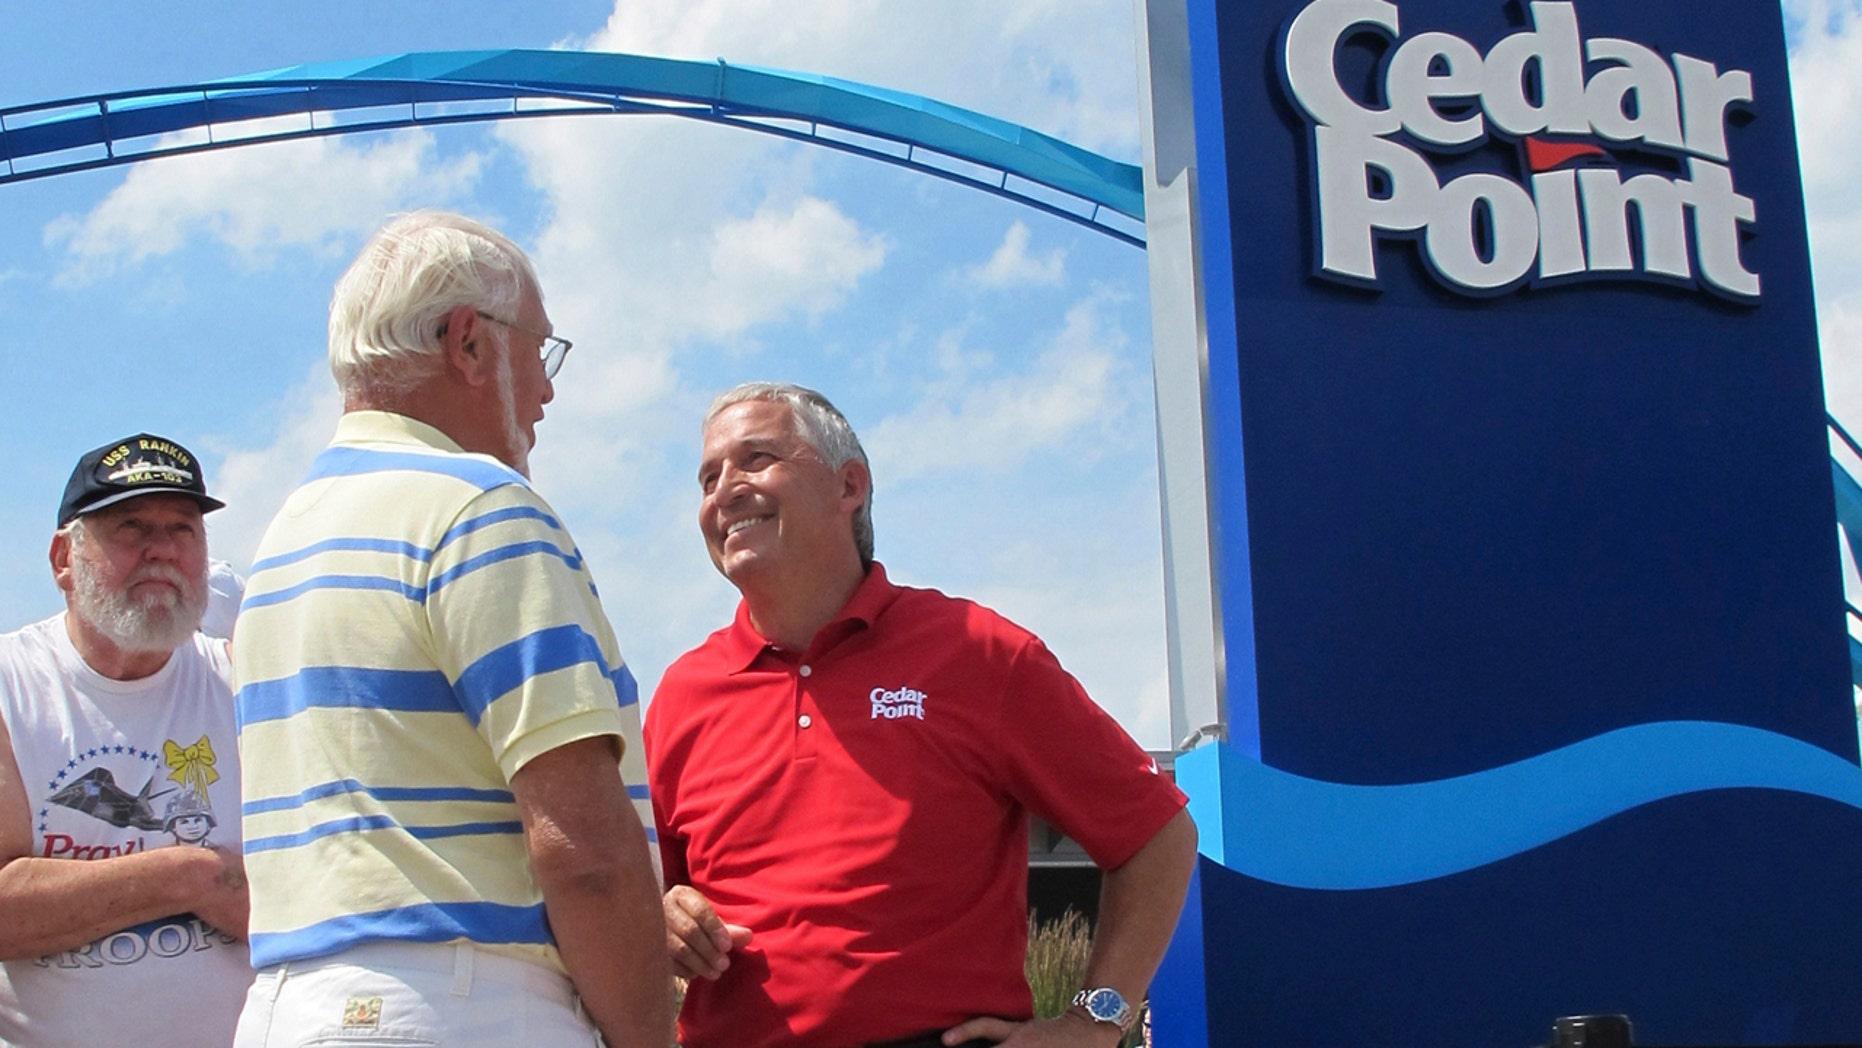 FILE - In this July 2, 2014, file photo, Matt Ouimet, chief executive of Cedar Fair Entertainment Co., greets a guest at Cedar Point amusement park, in Sandusky, Ohio.